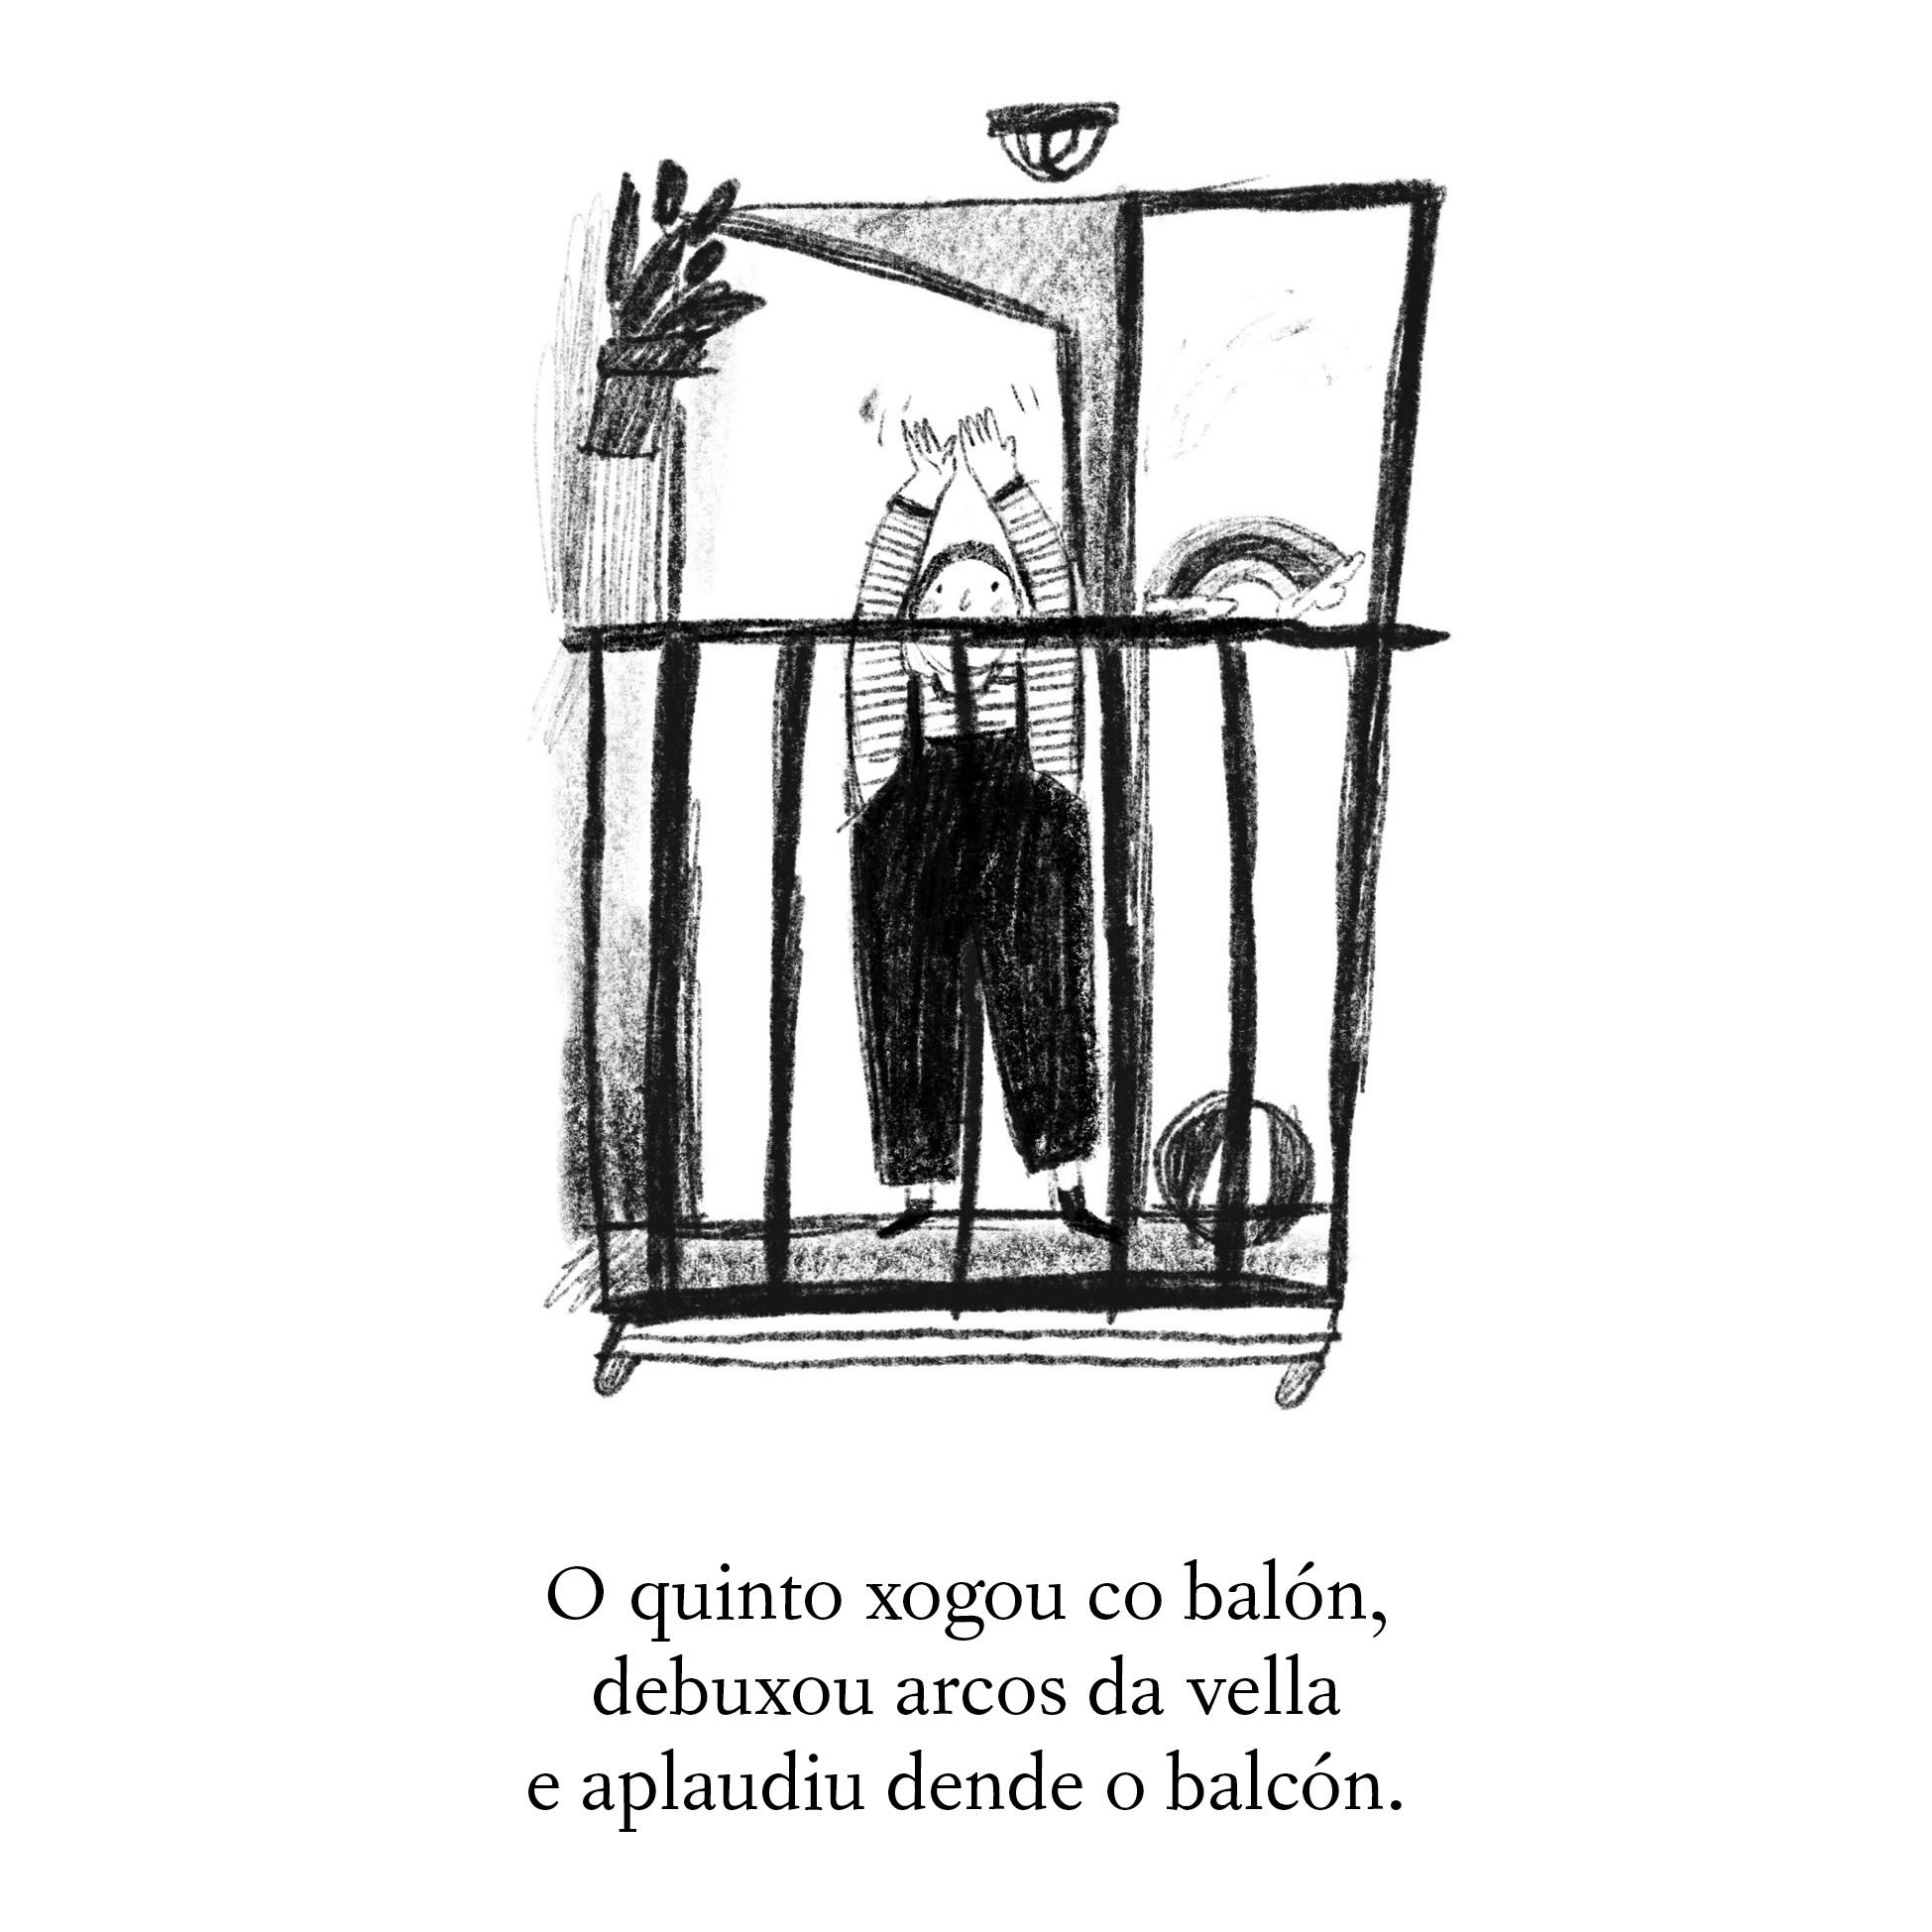 #euquedonacasa - quinto